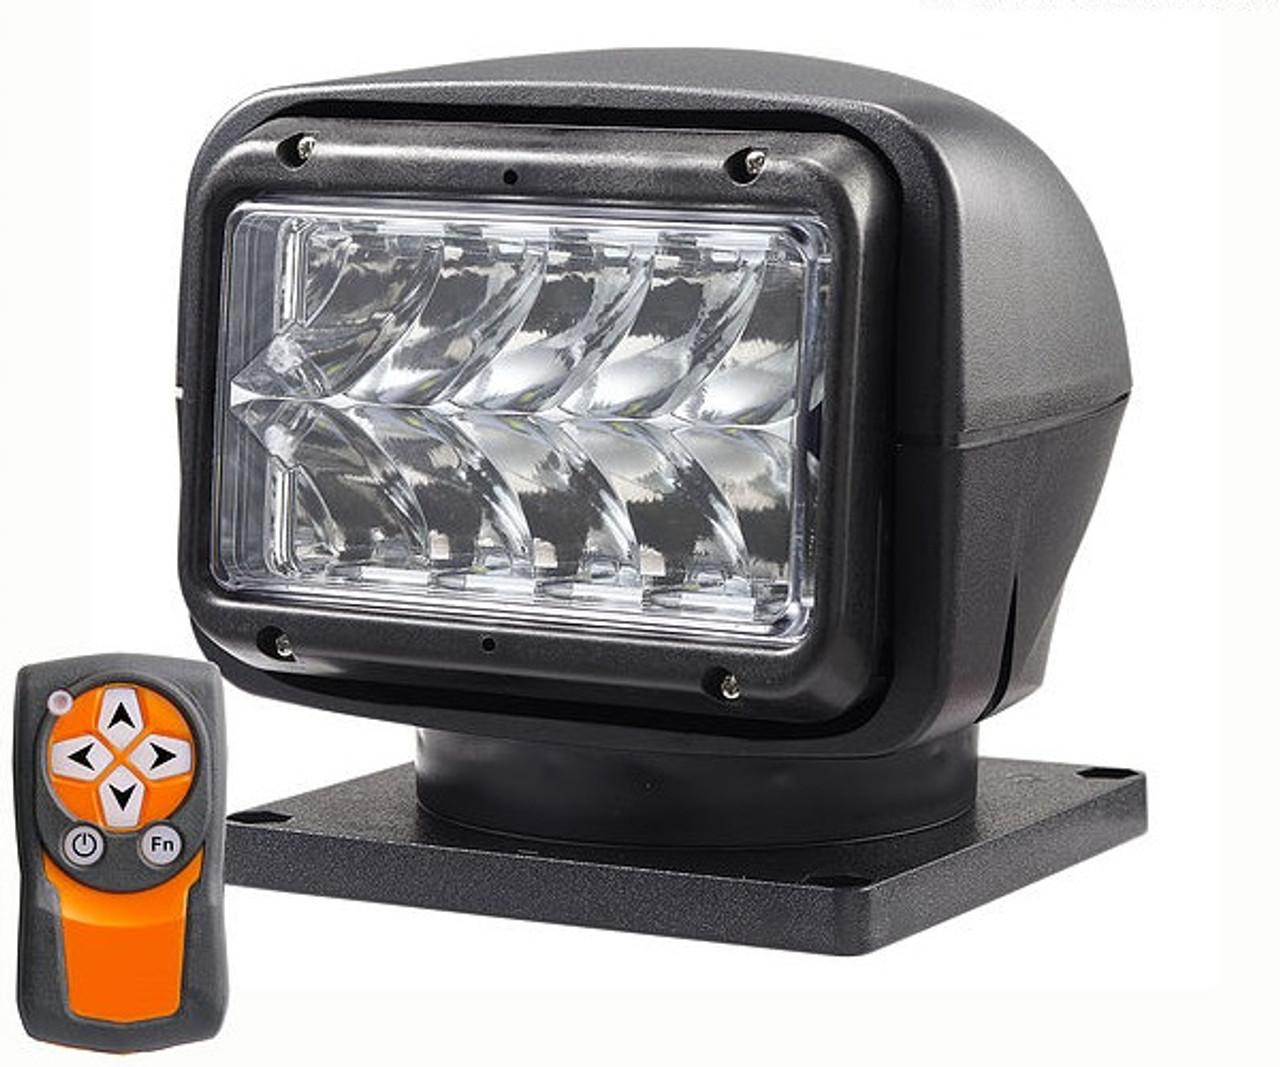 Long Range Spot Light in Black with handheld wireless remote